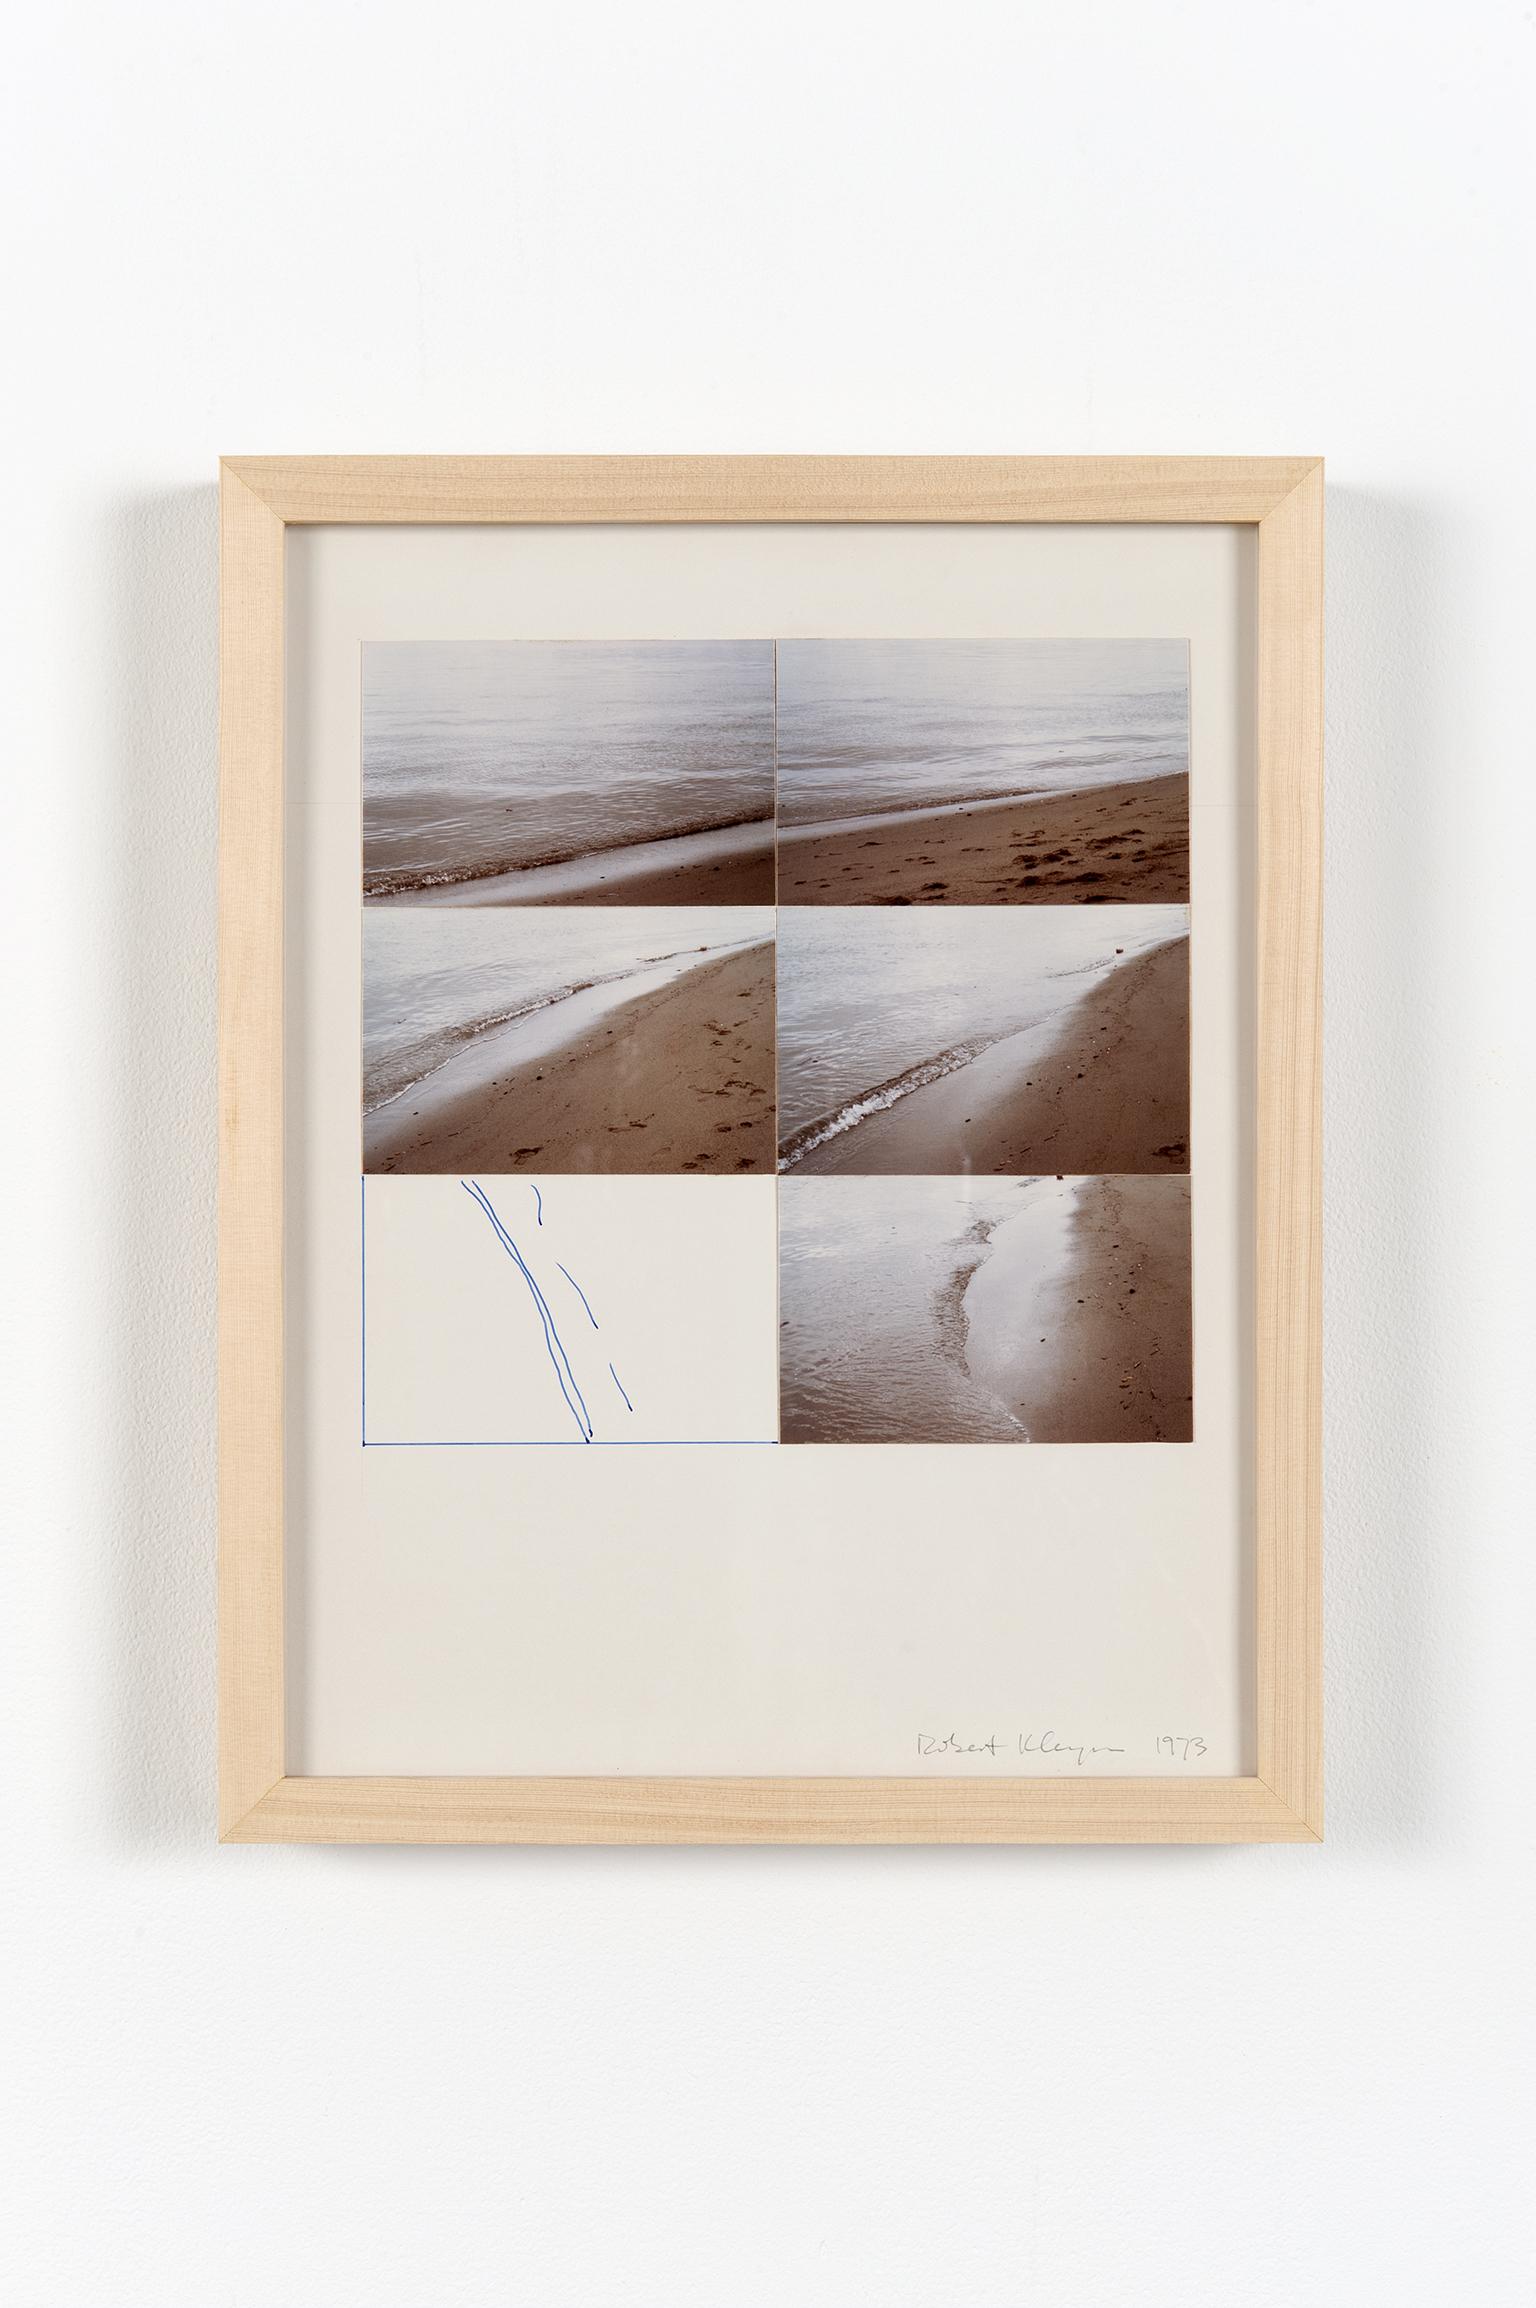 Robert Kleyn, Shoreline, 1973, photographs and ink on cardstock, 15 x 12 in. (39 x 31 cm) by